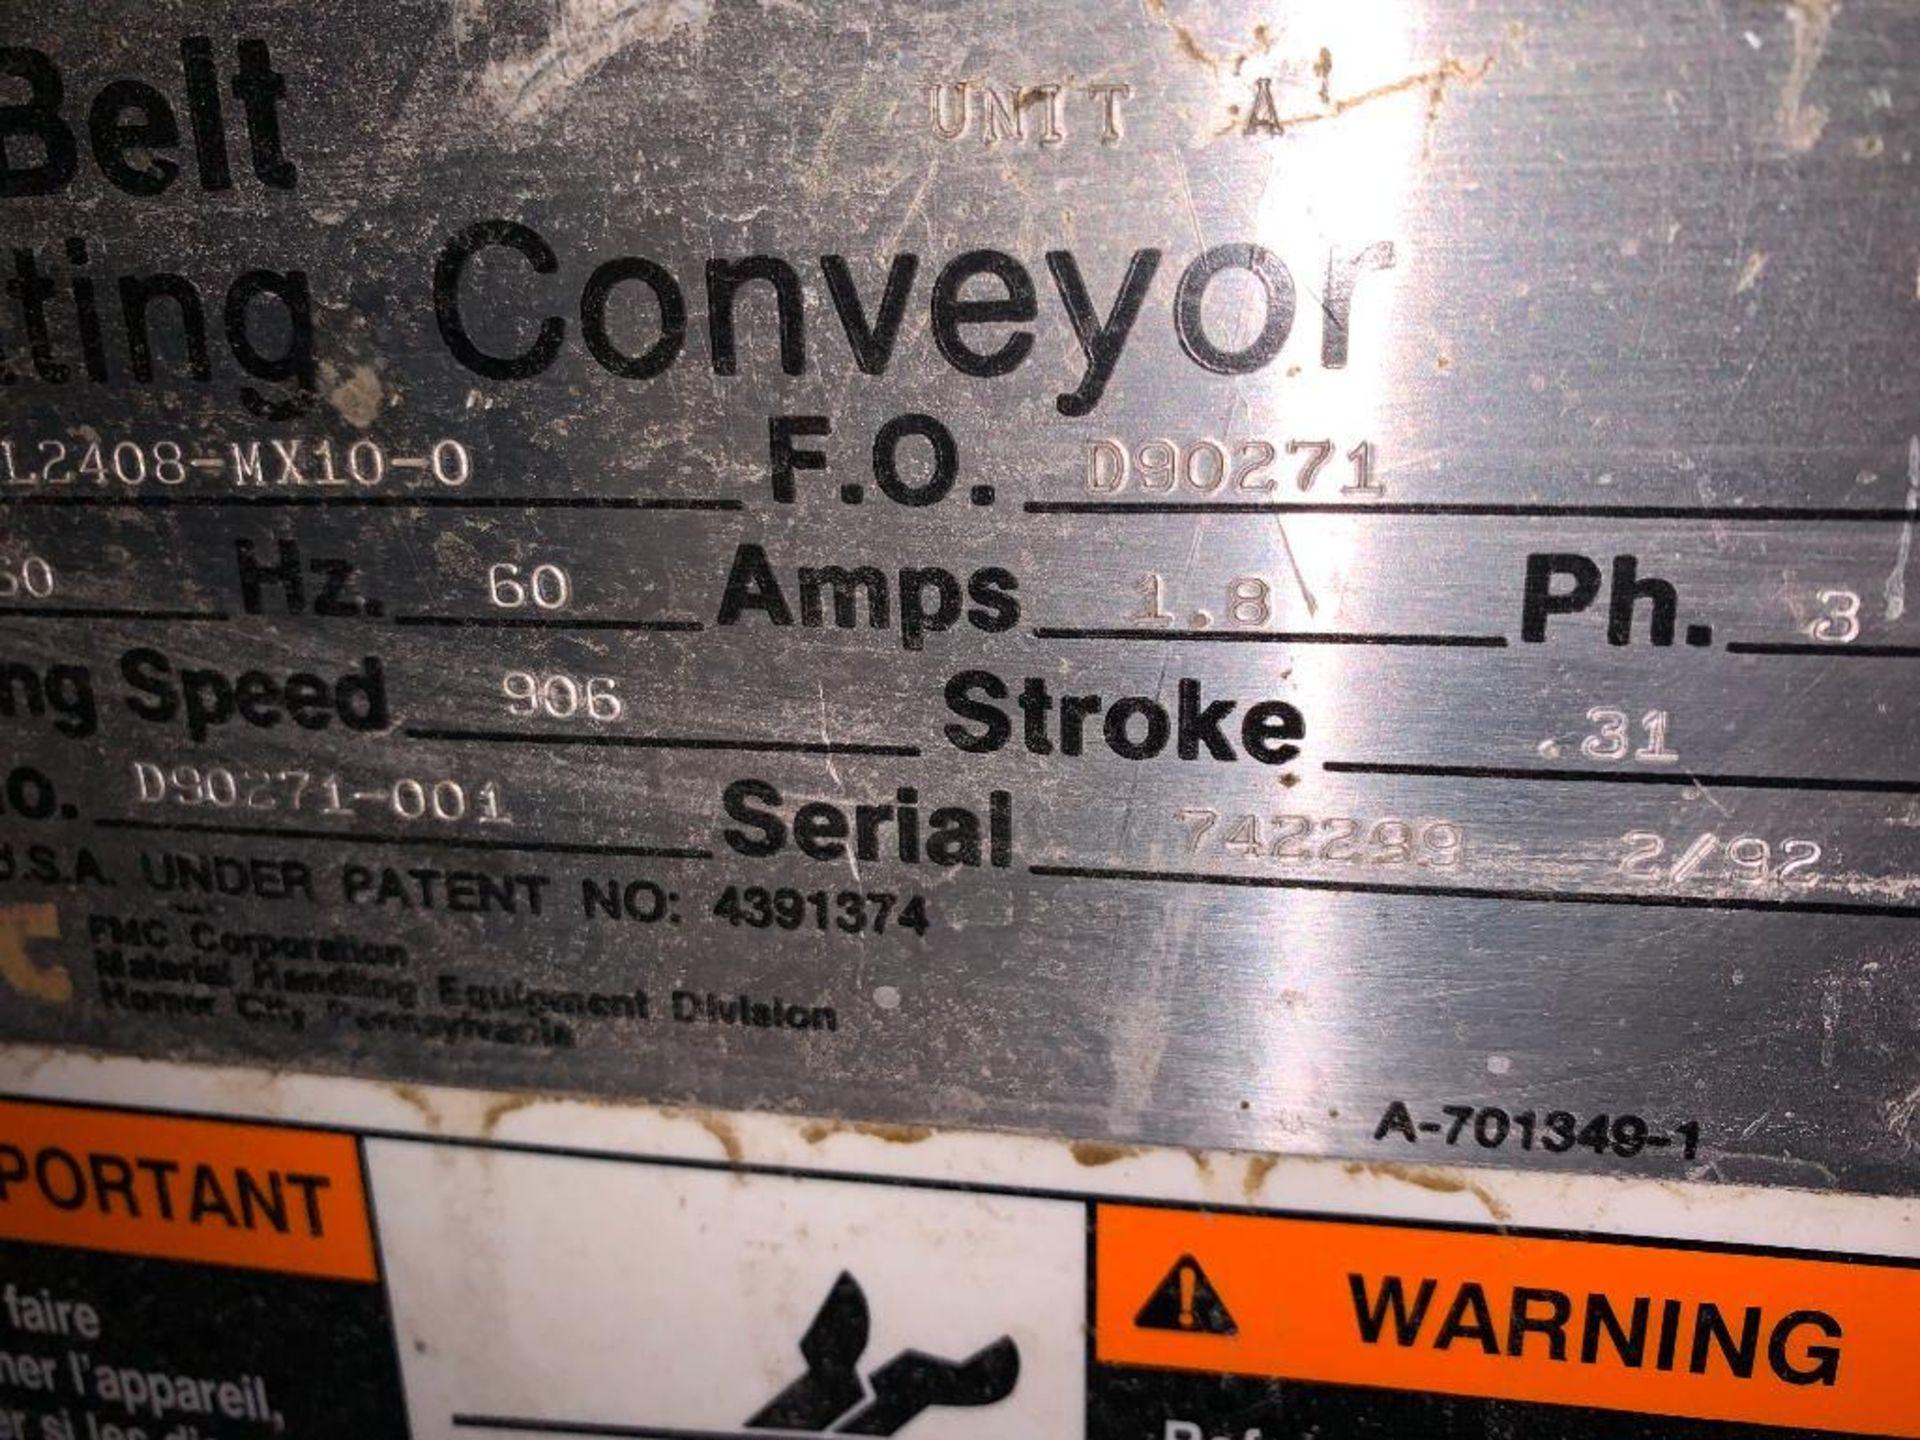 1993 Link-Belt stainless steel vibratory scalping conveyor - Image 6 of 10